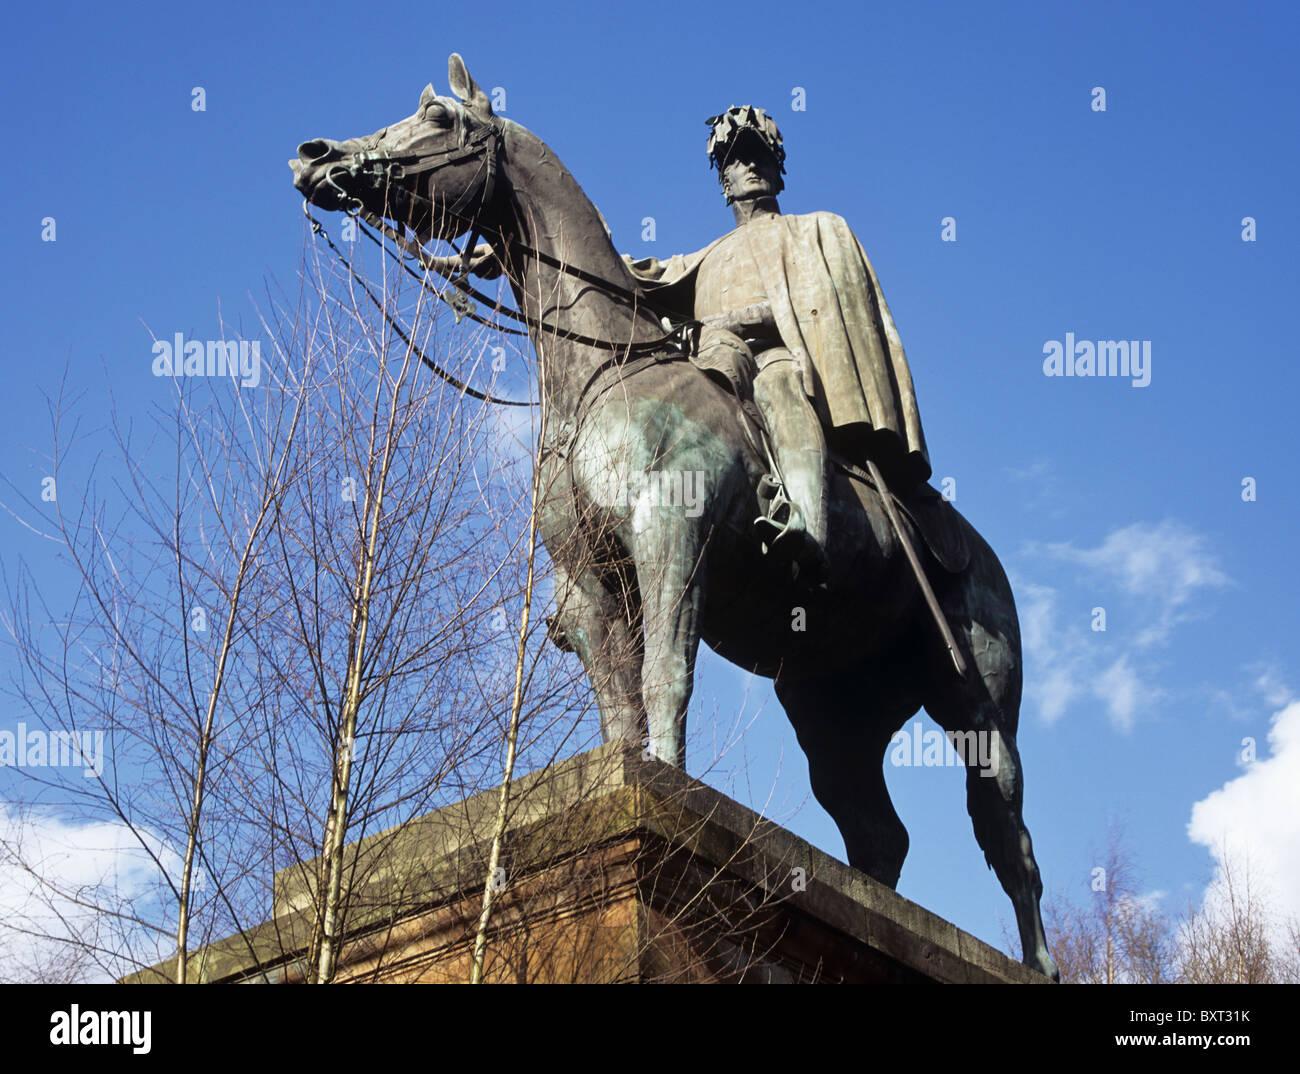 Aldershot Hampshire England UK Statue of Duke of Wellington sitting on his horse Copenhagen - Stock Image